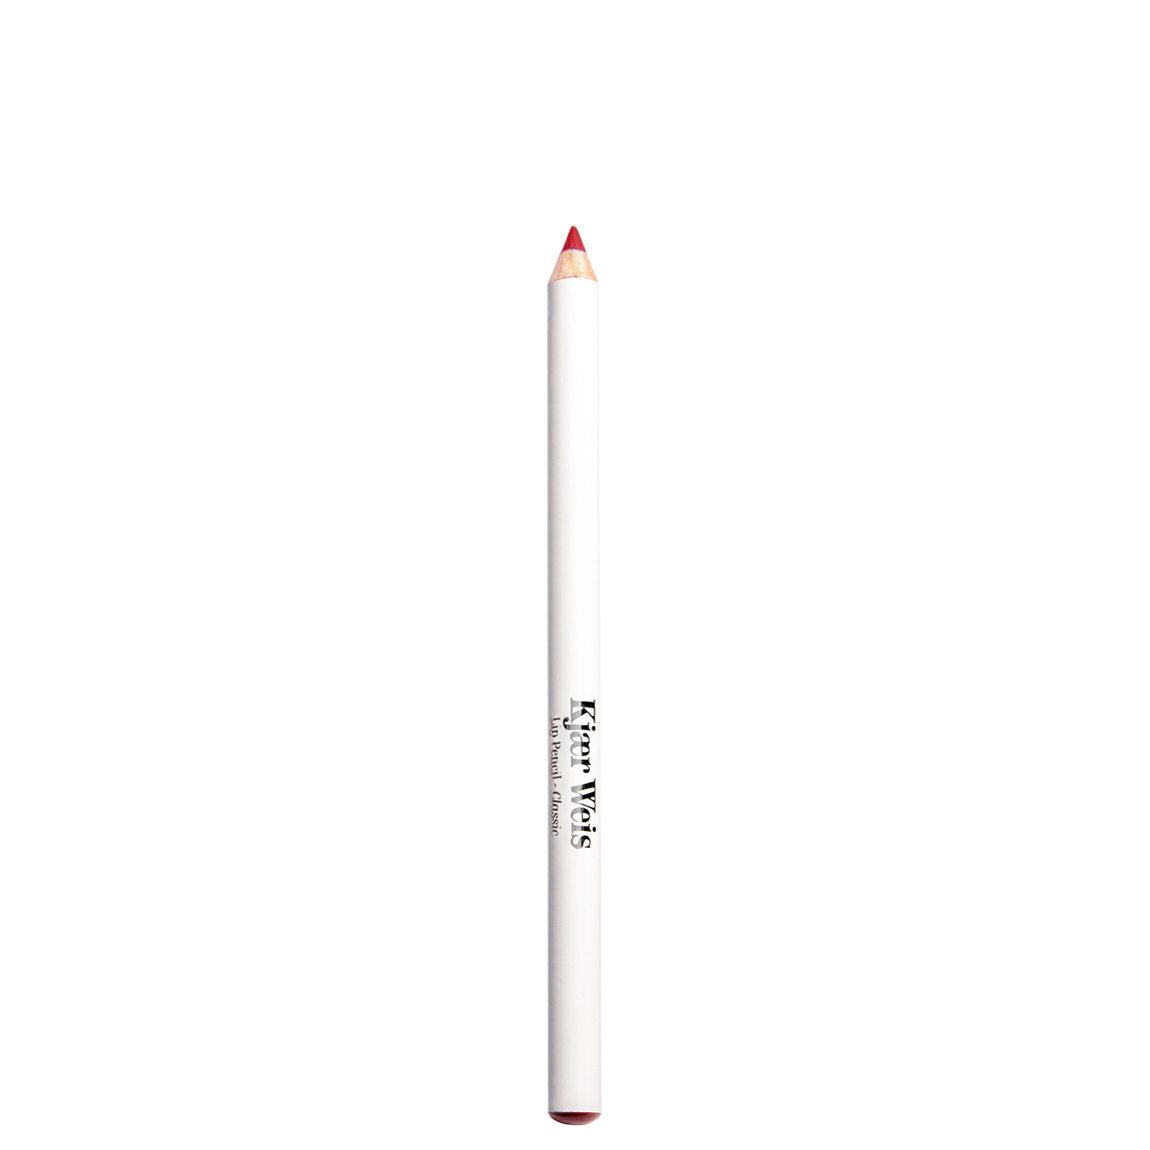 Kjaer Weis Lip Pencil Refill Classic alternative view 1.